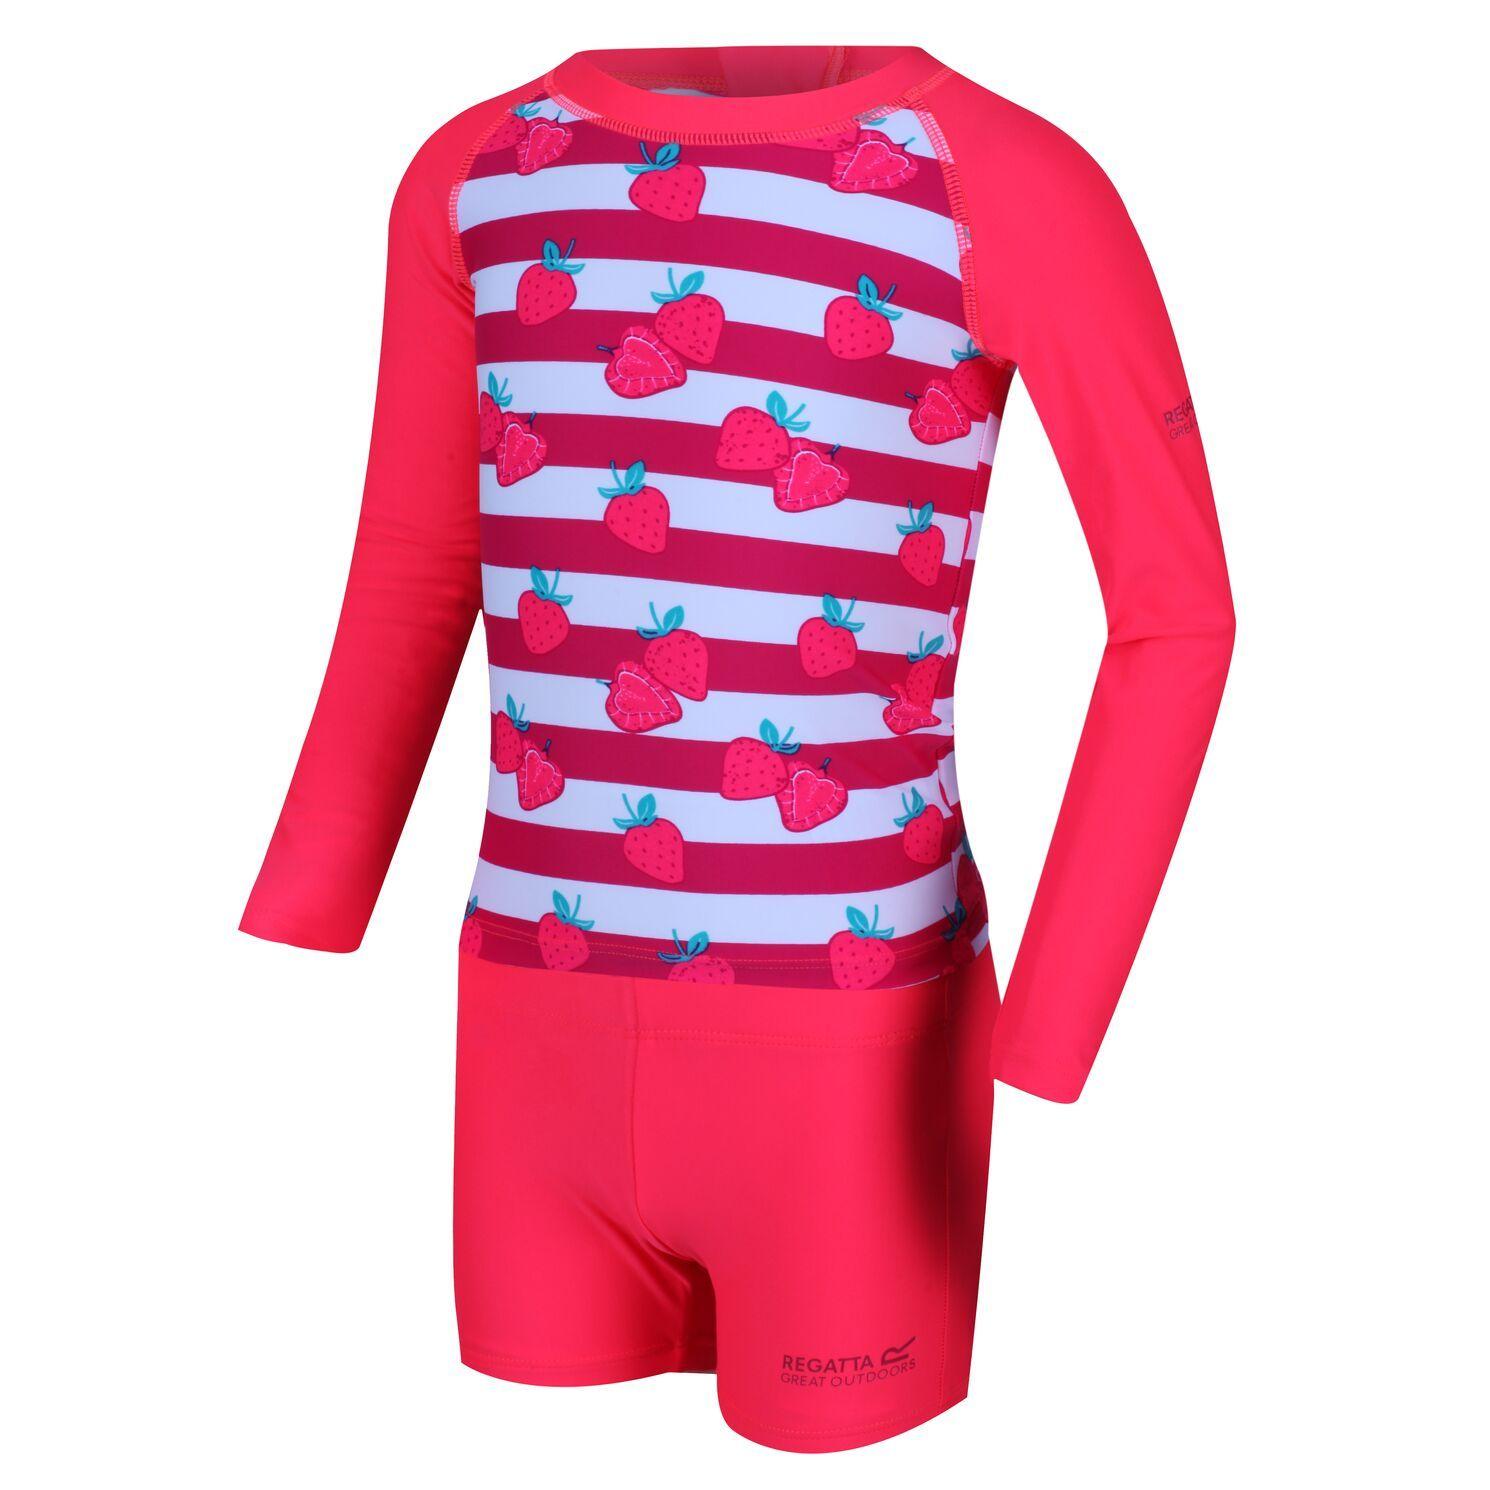 Regatta Childrens/Kids Valo Rash Suit